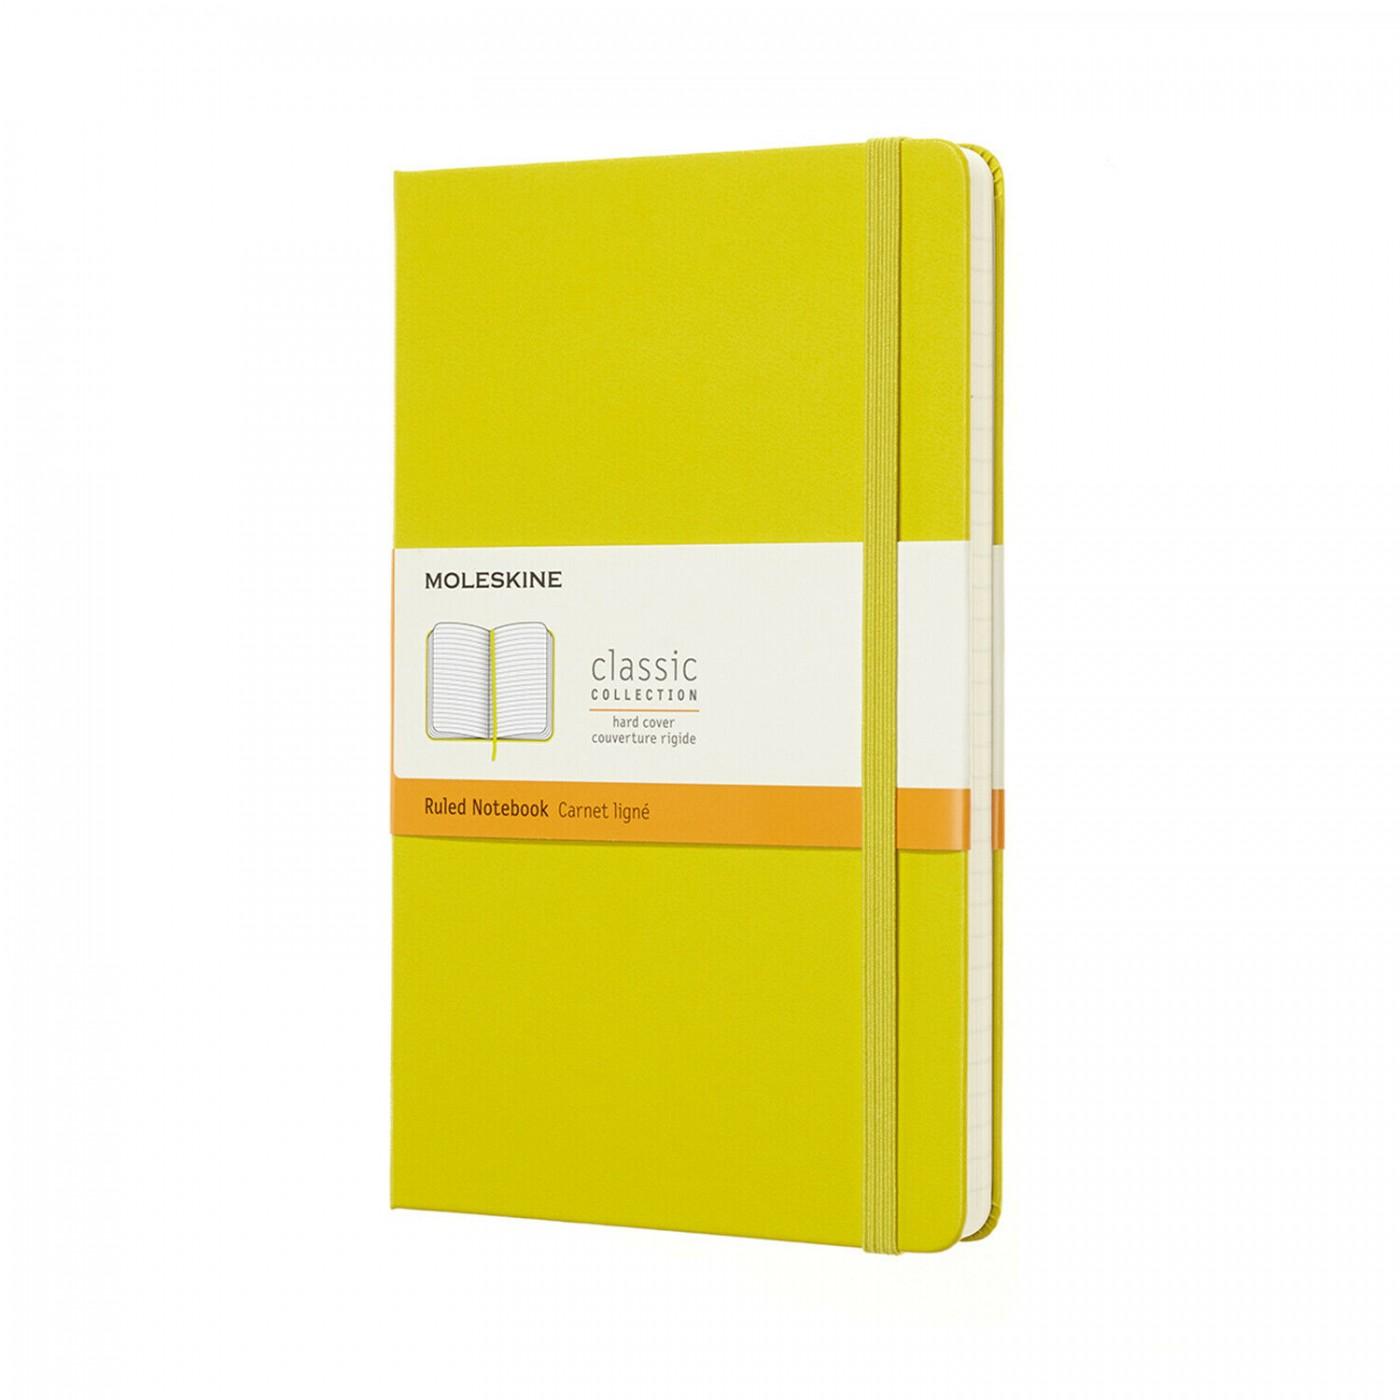 MOLESKINE taccuino Classic, large, copertina rigida giallo